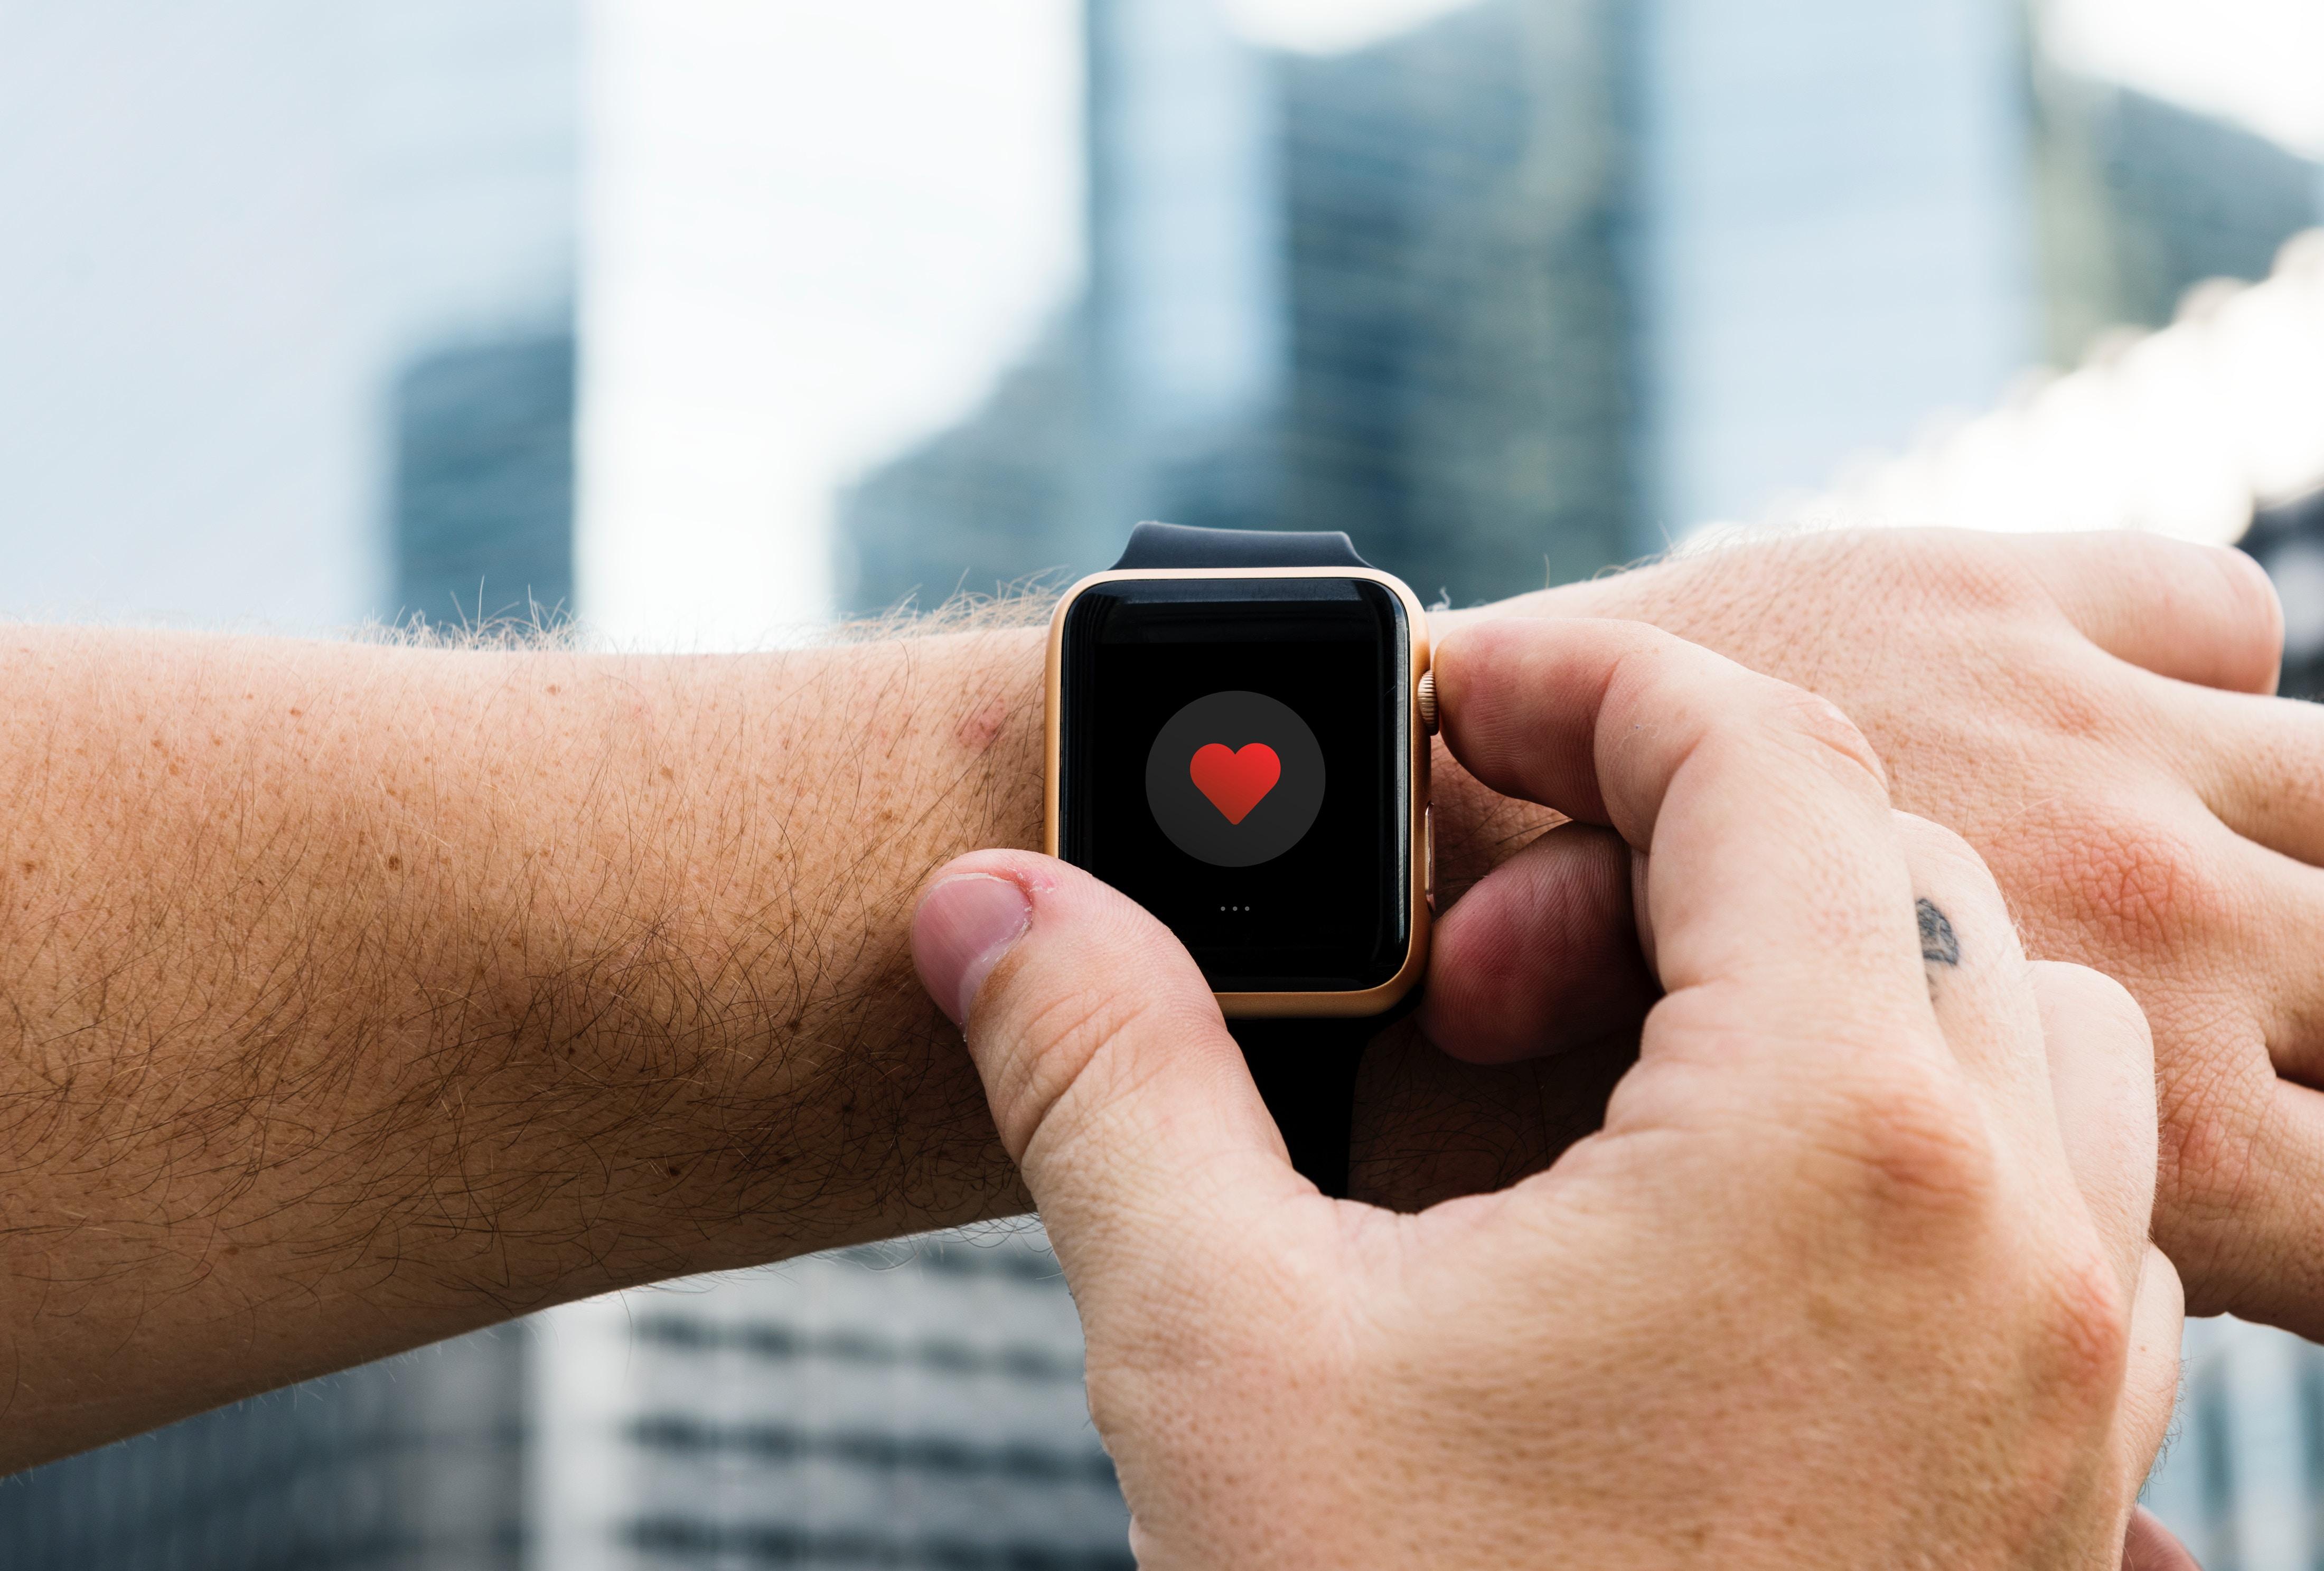 Apple Watch to warn of sunburn